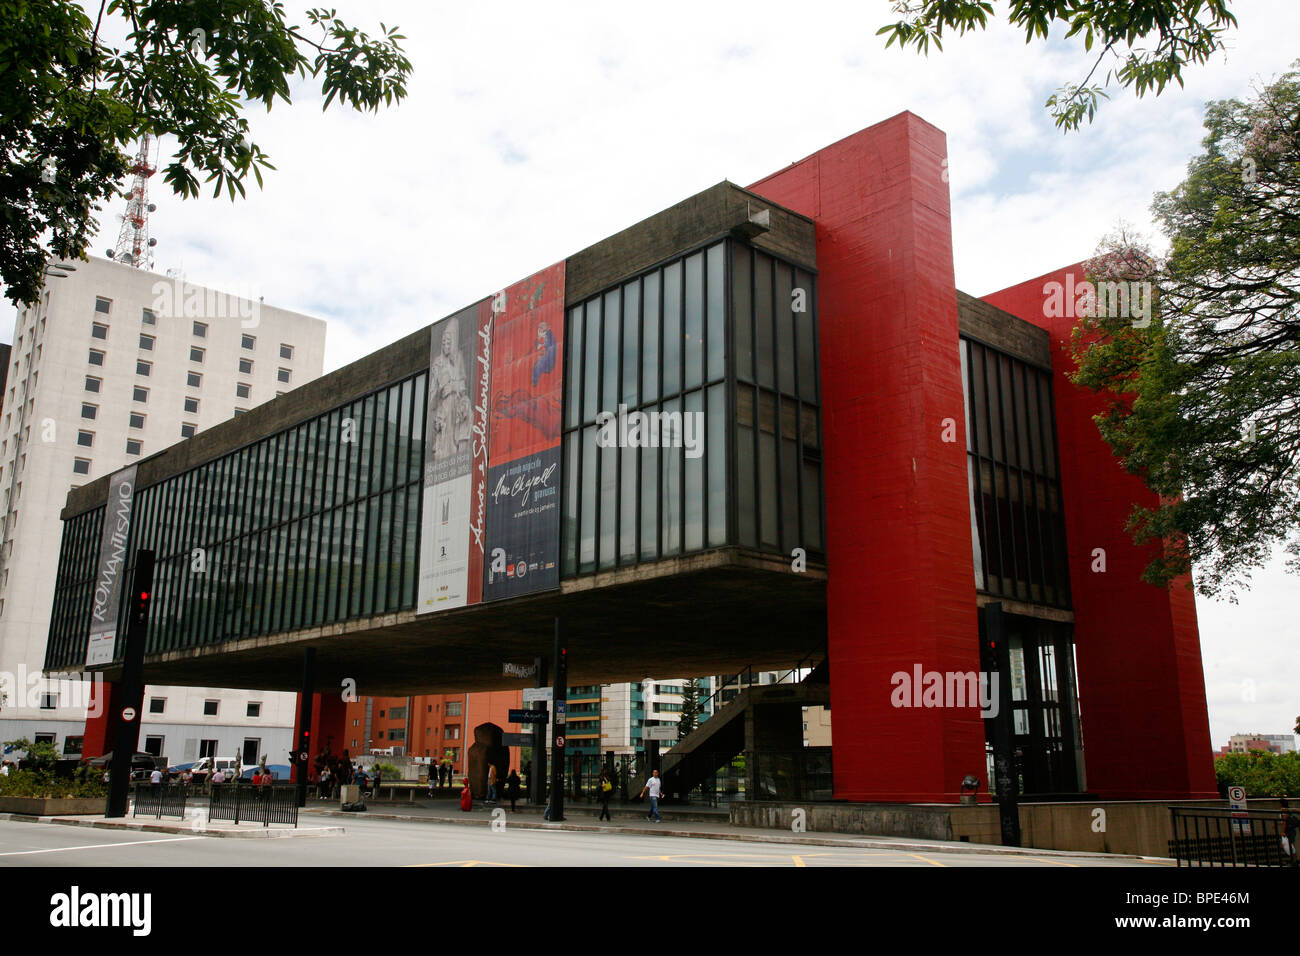 Museu de Arte de Sao Paulo (MASP), Sao Paulo, Brazil. - Stock Image